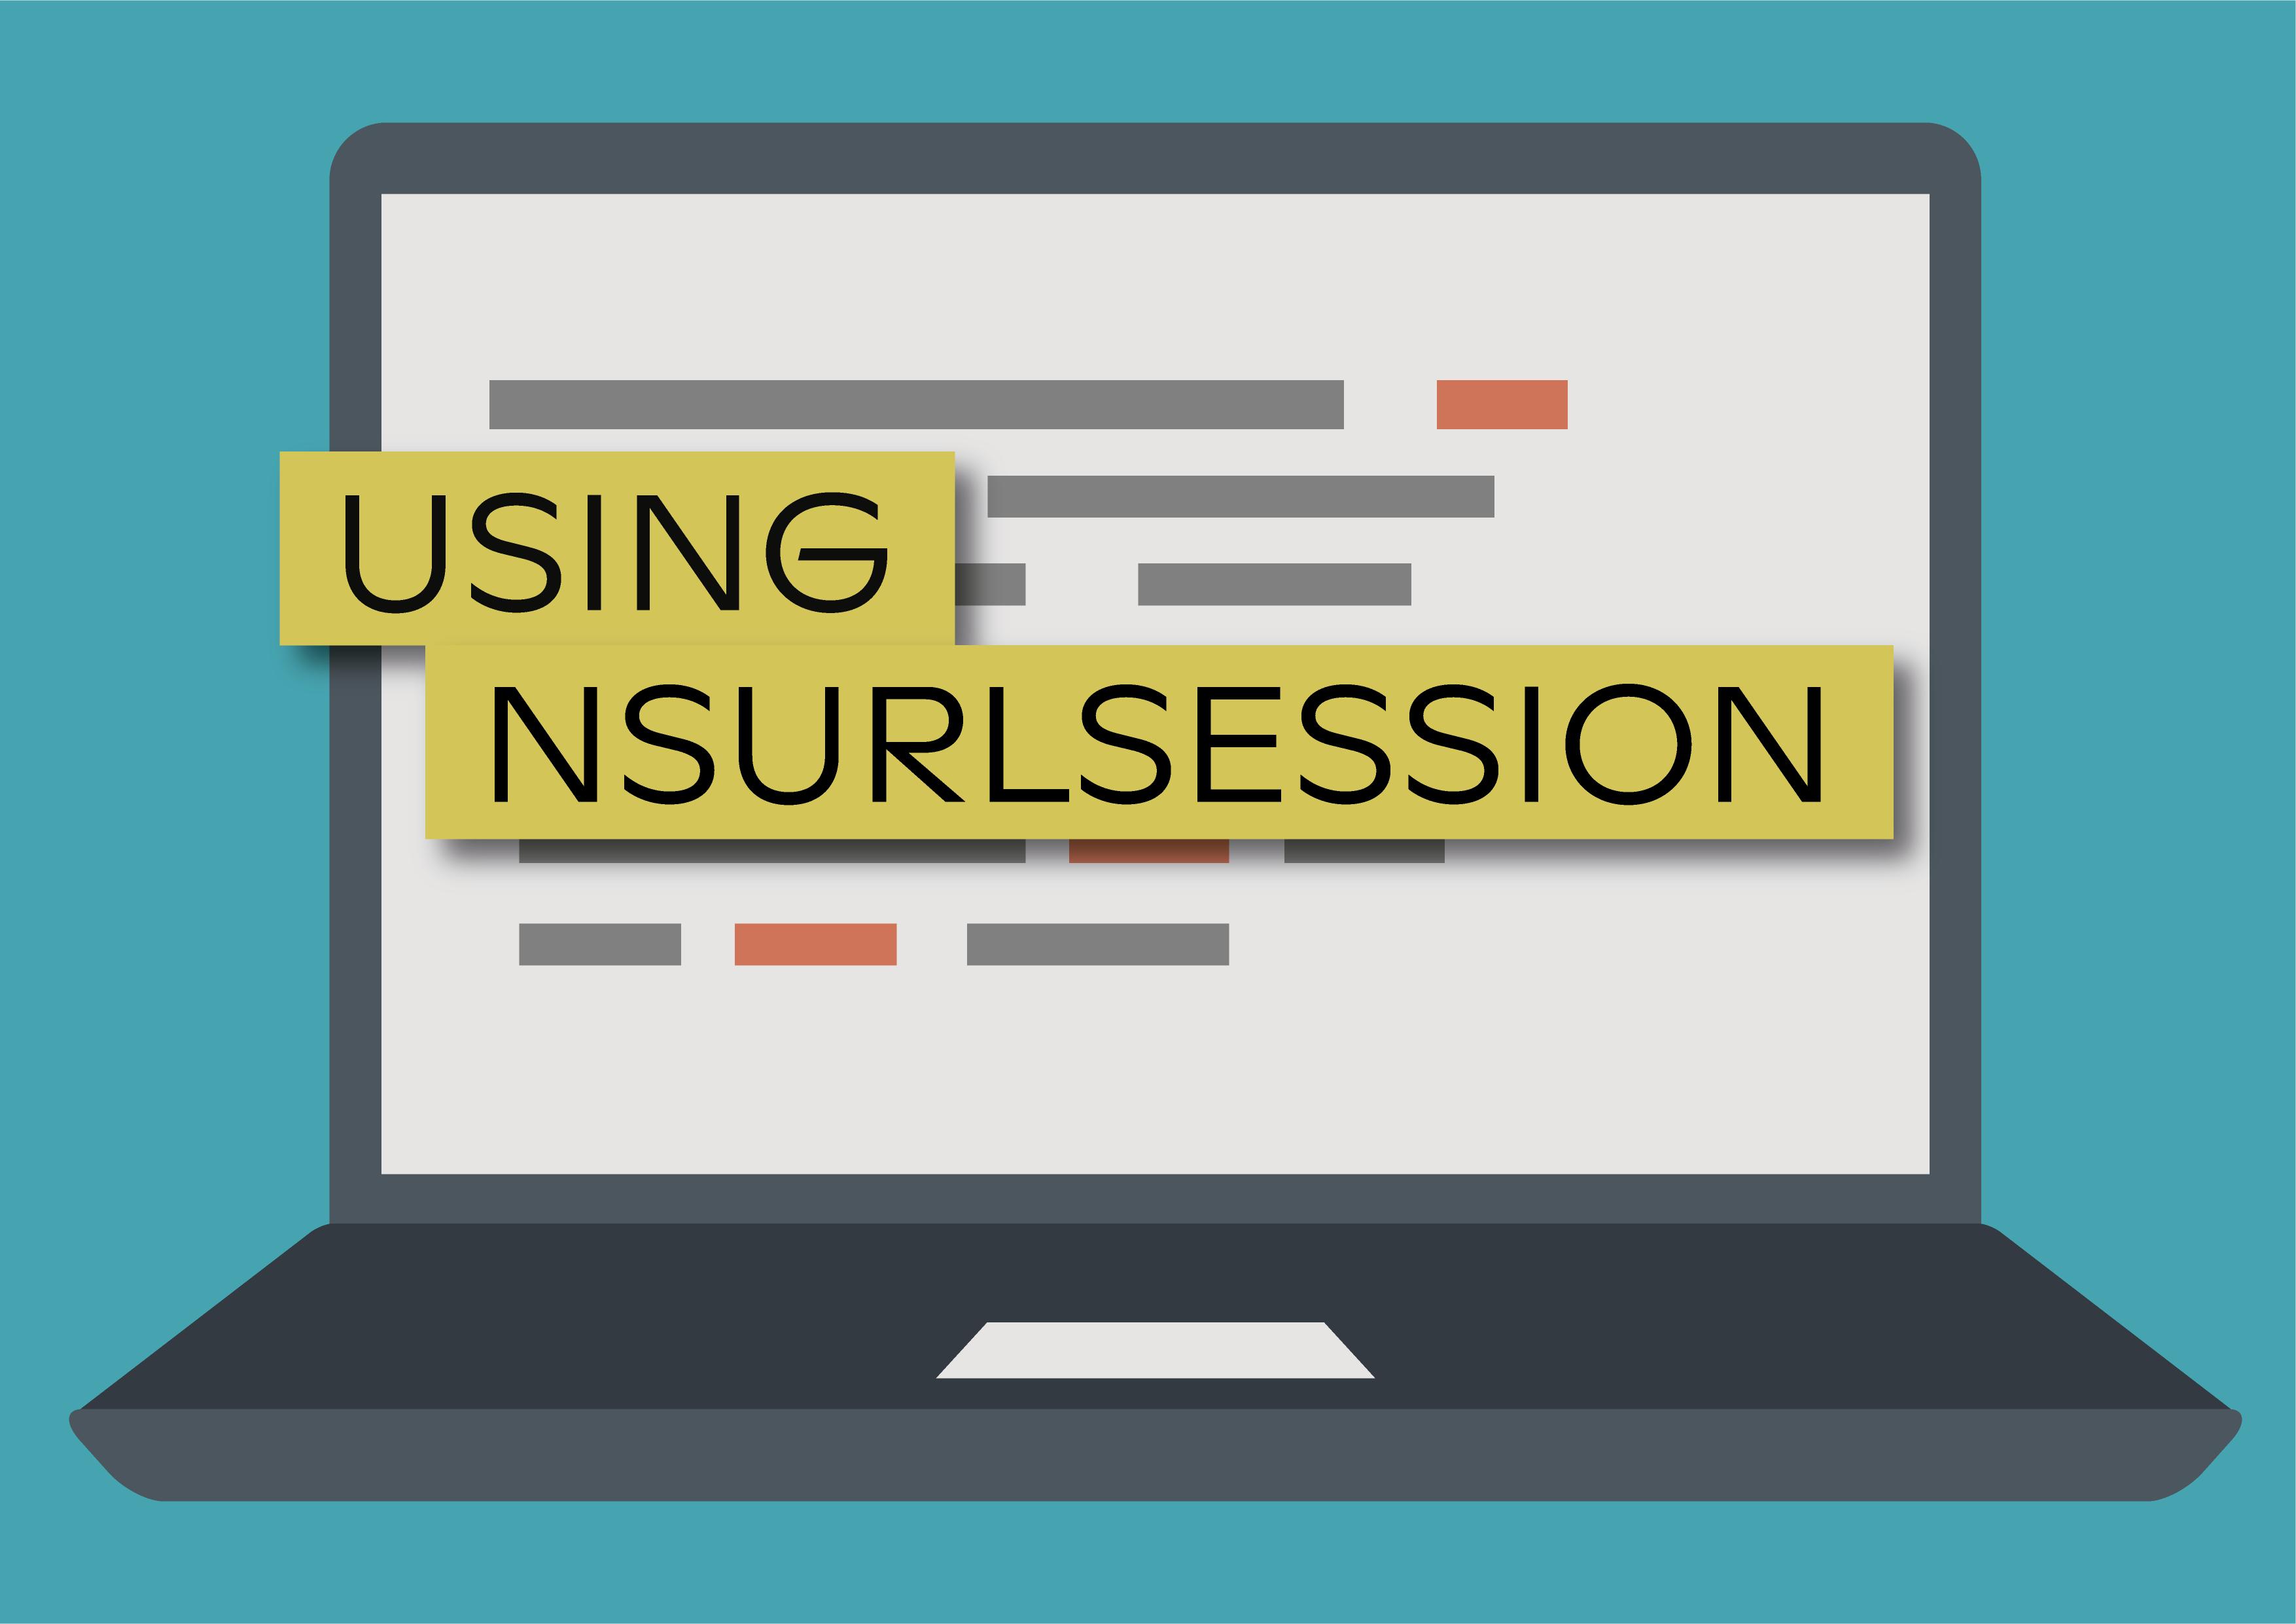 usingnsurlsession